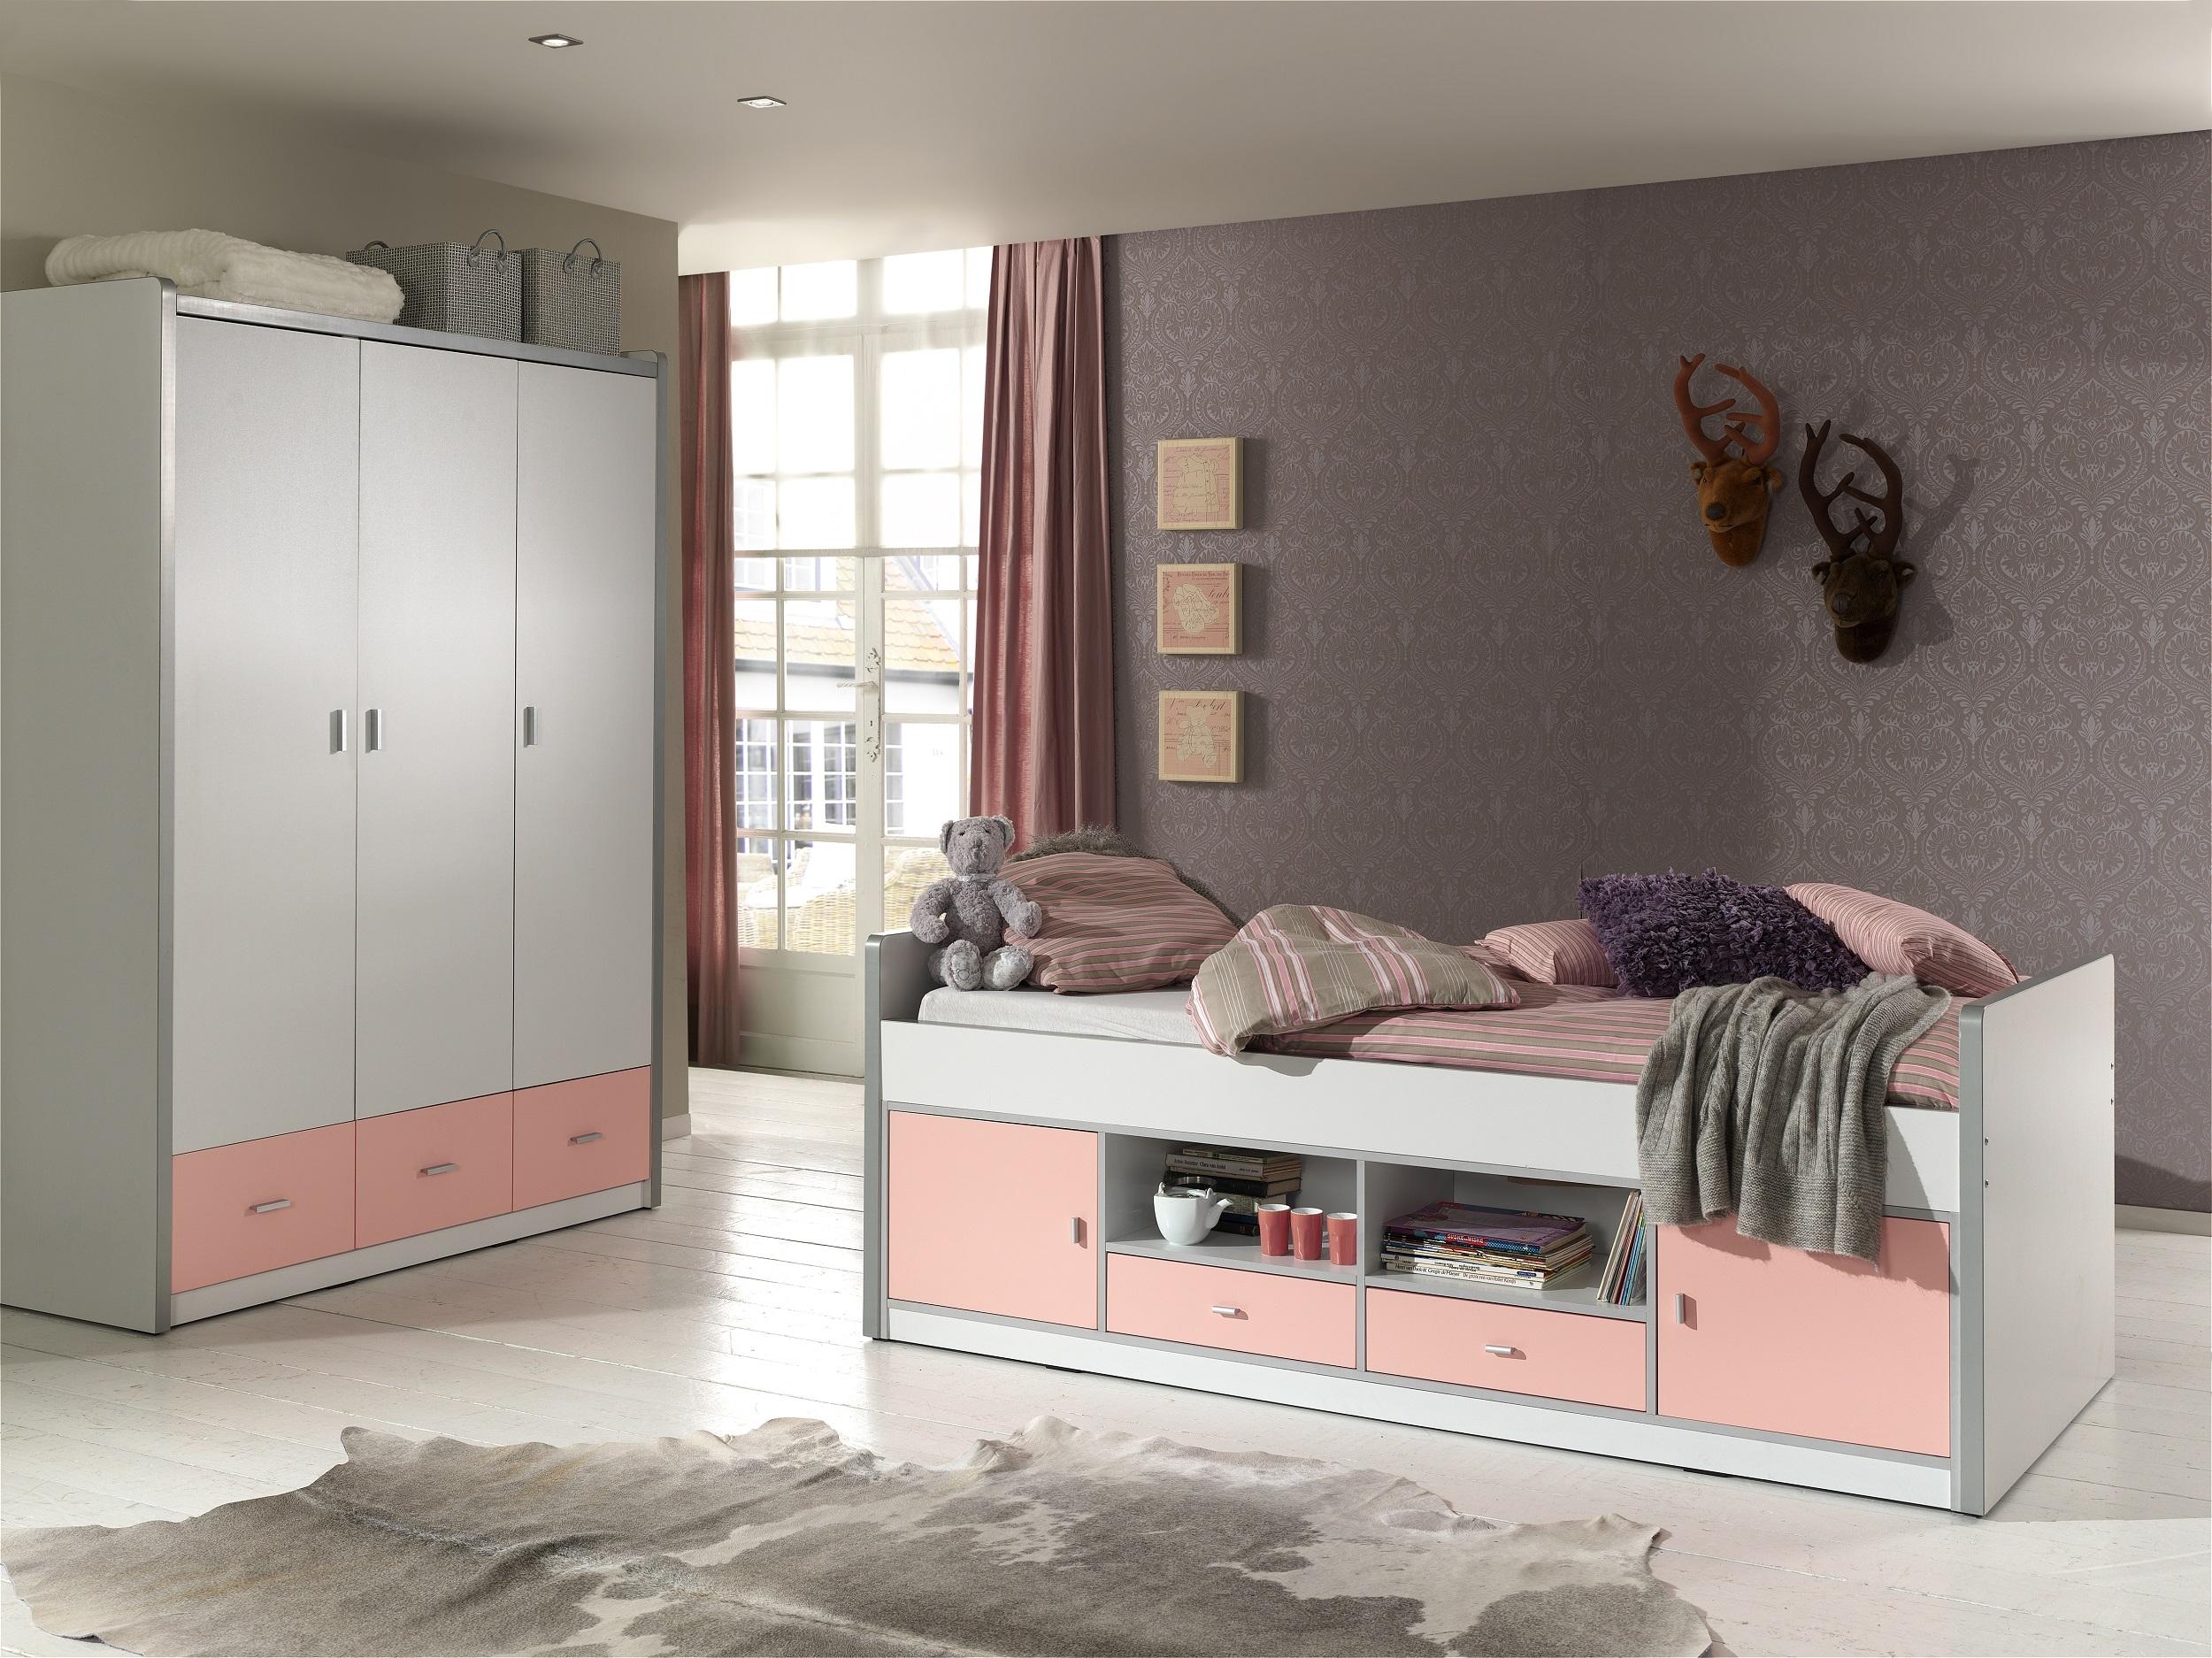 Set Mobila dormitor din pal, pentru copii 2 piese Bonny Capitan Alb / Roz, 200 x 90 cm somproduct.ro